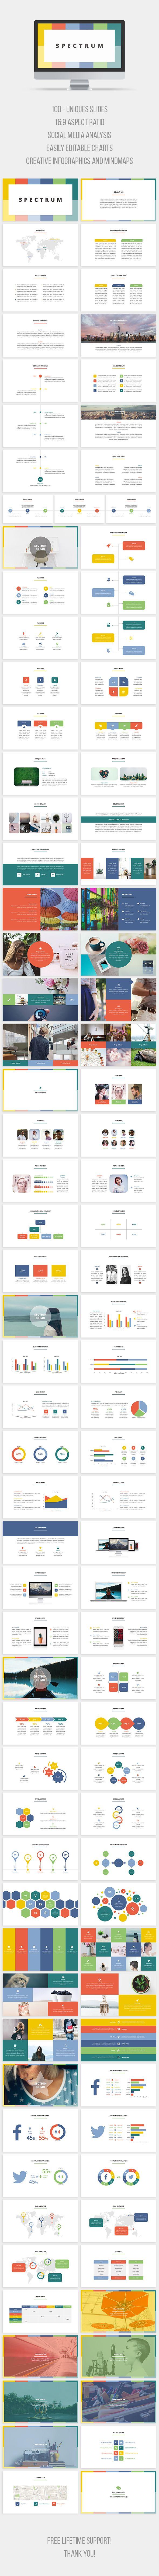 Spectrum PowerPoint Template. Download here: https://graphicriver.net/item/spectrum-powerpoint-template/17218477?ref=ksioks